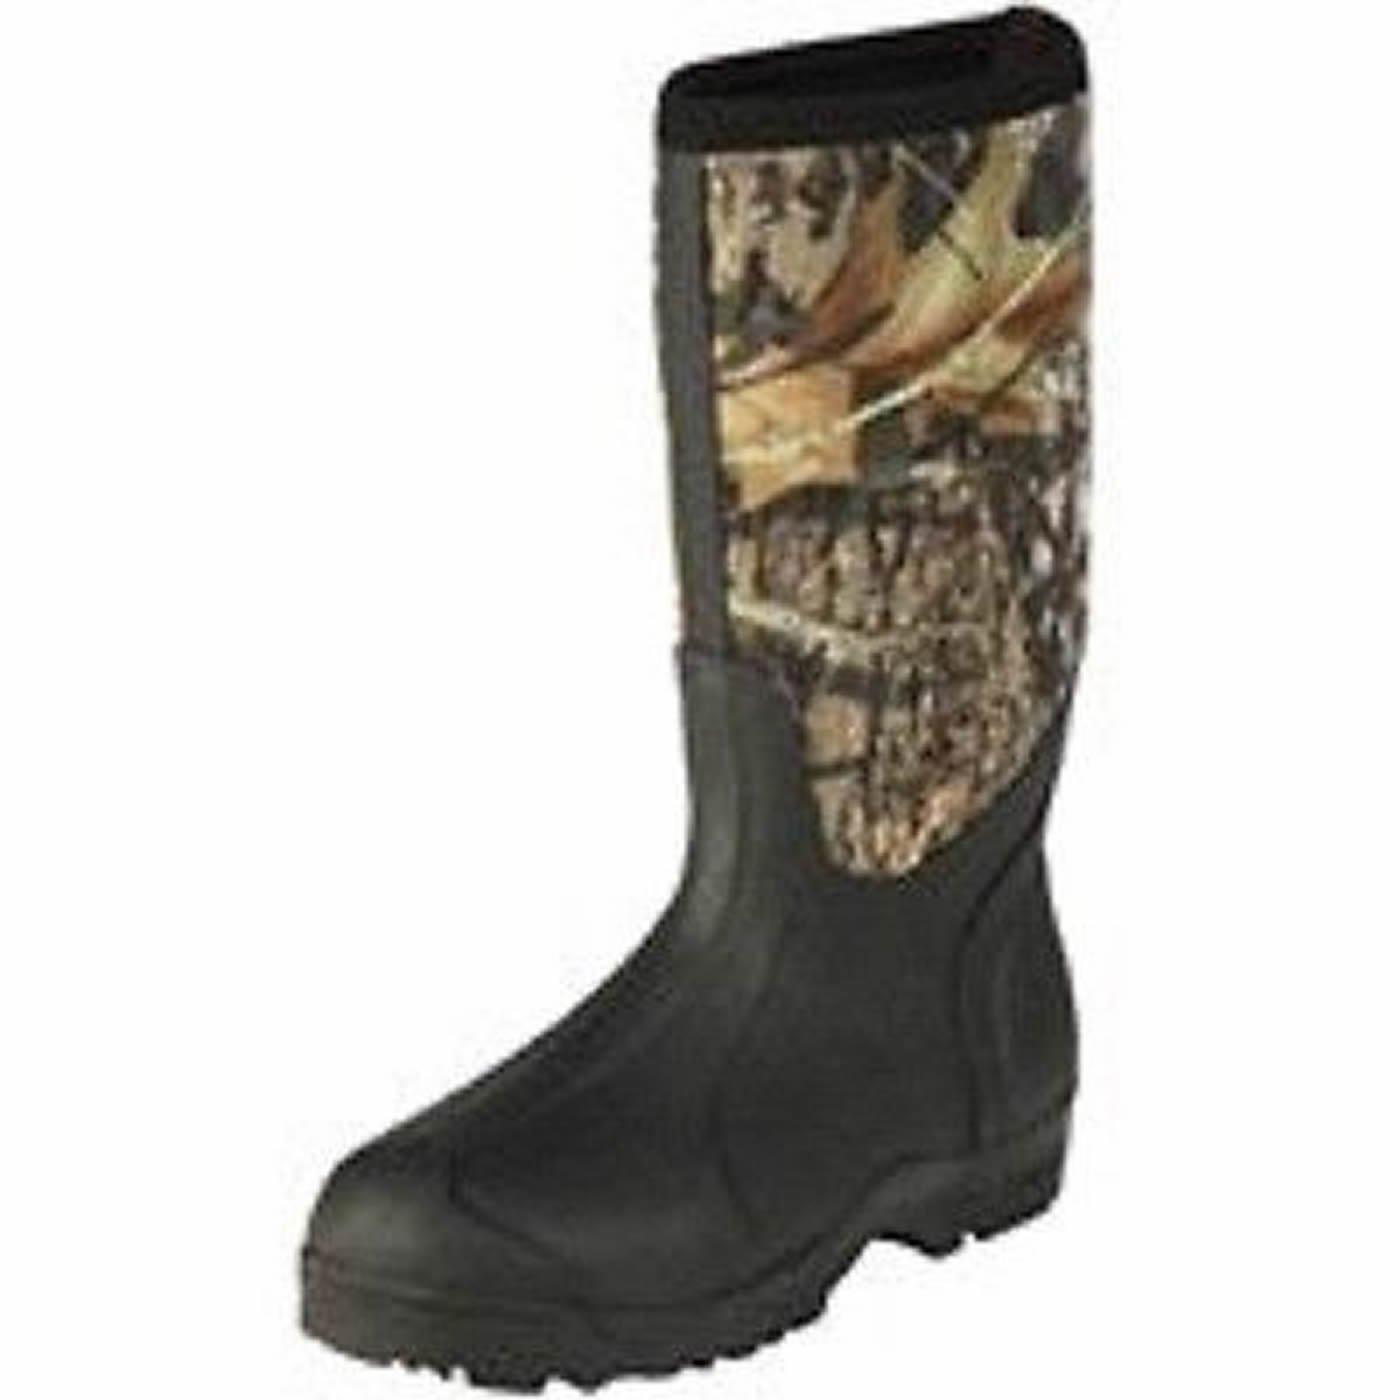 New Norcross 67503 Size 12 Mossy Oak Camo Break Up Sole 15'' Work Hunting Boots